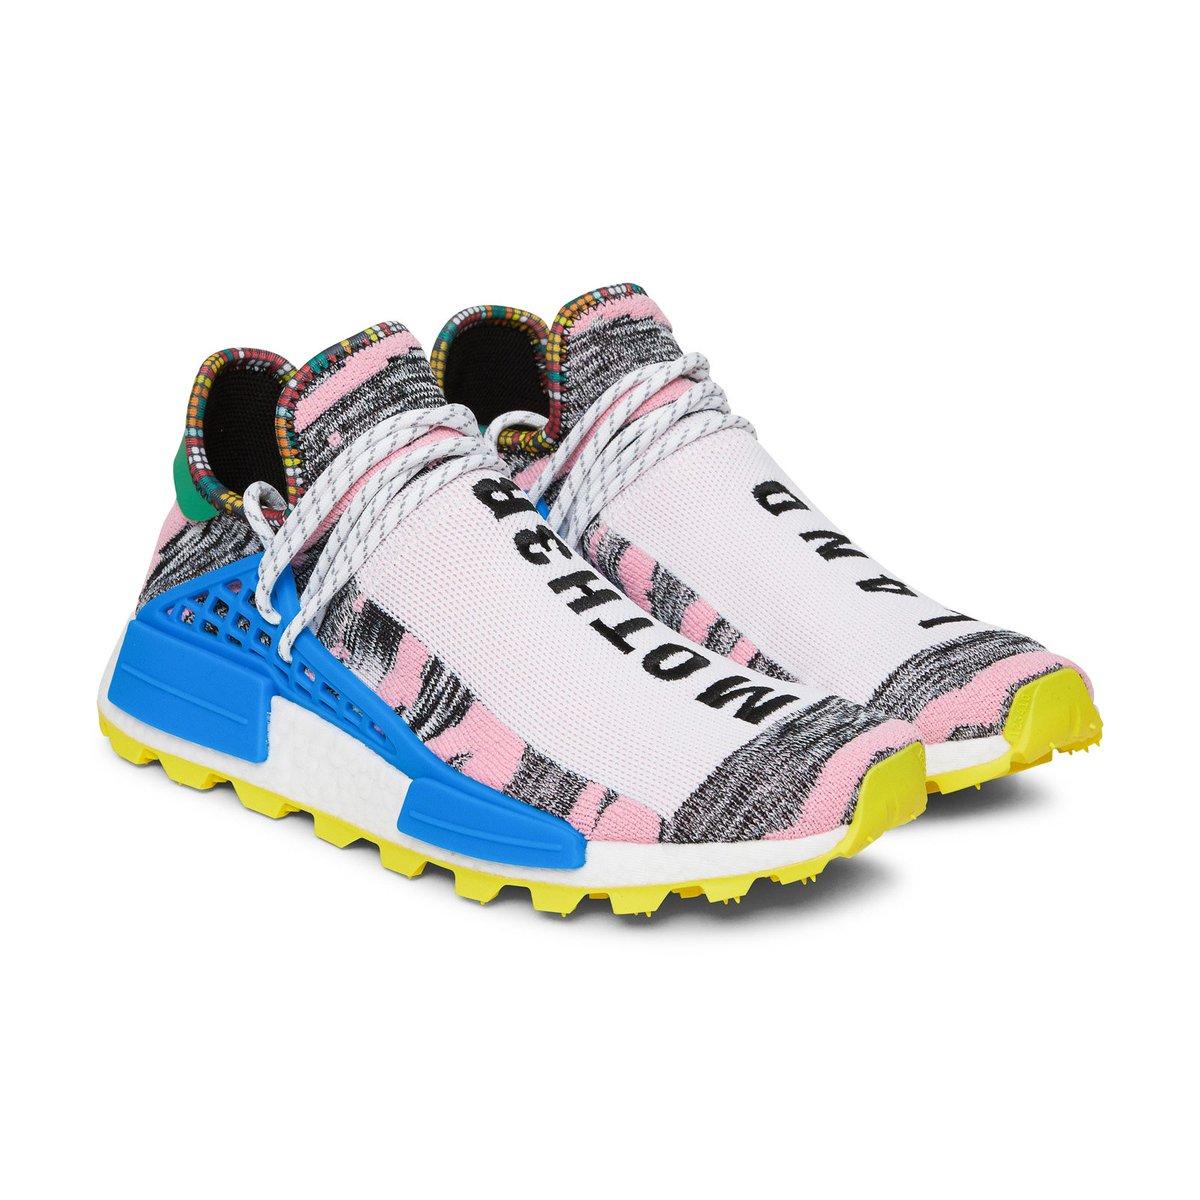 ac7ef9142579 Pharrell Williams x adidas Originals Solar HU NMD via SJS Direct links  Inspire http   tinyurl.com y9abznw4 Miele Mbele http   tinyurl.com y7m7gqvu  Mother ...